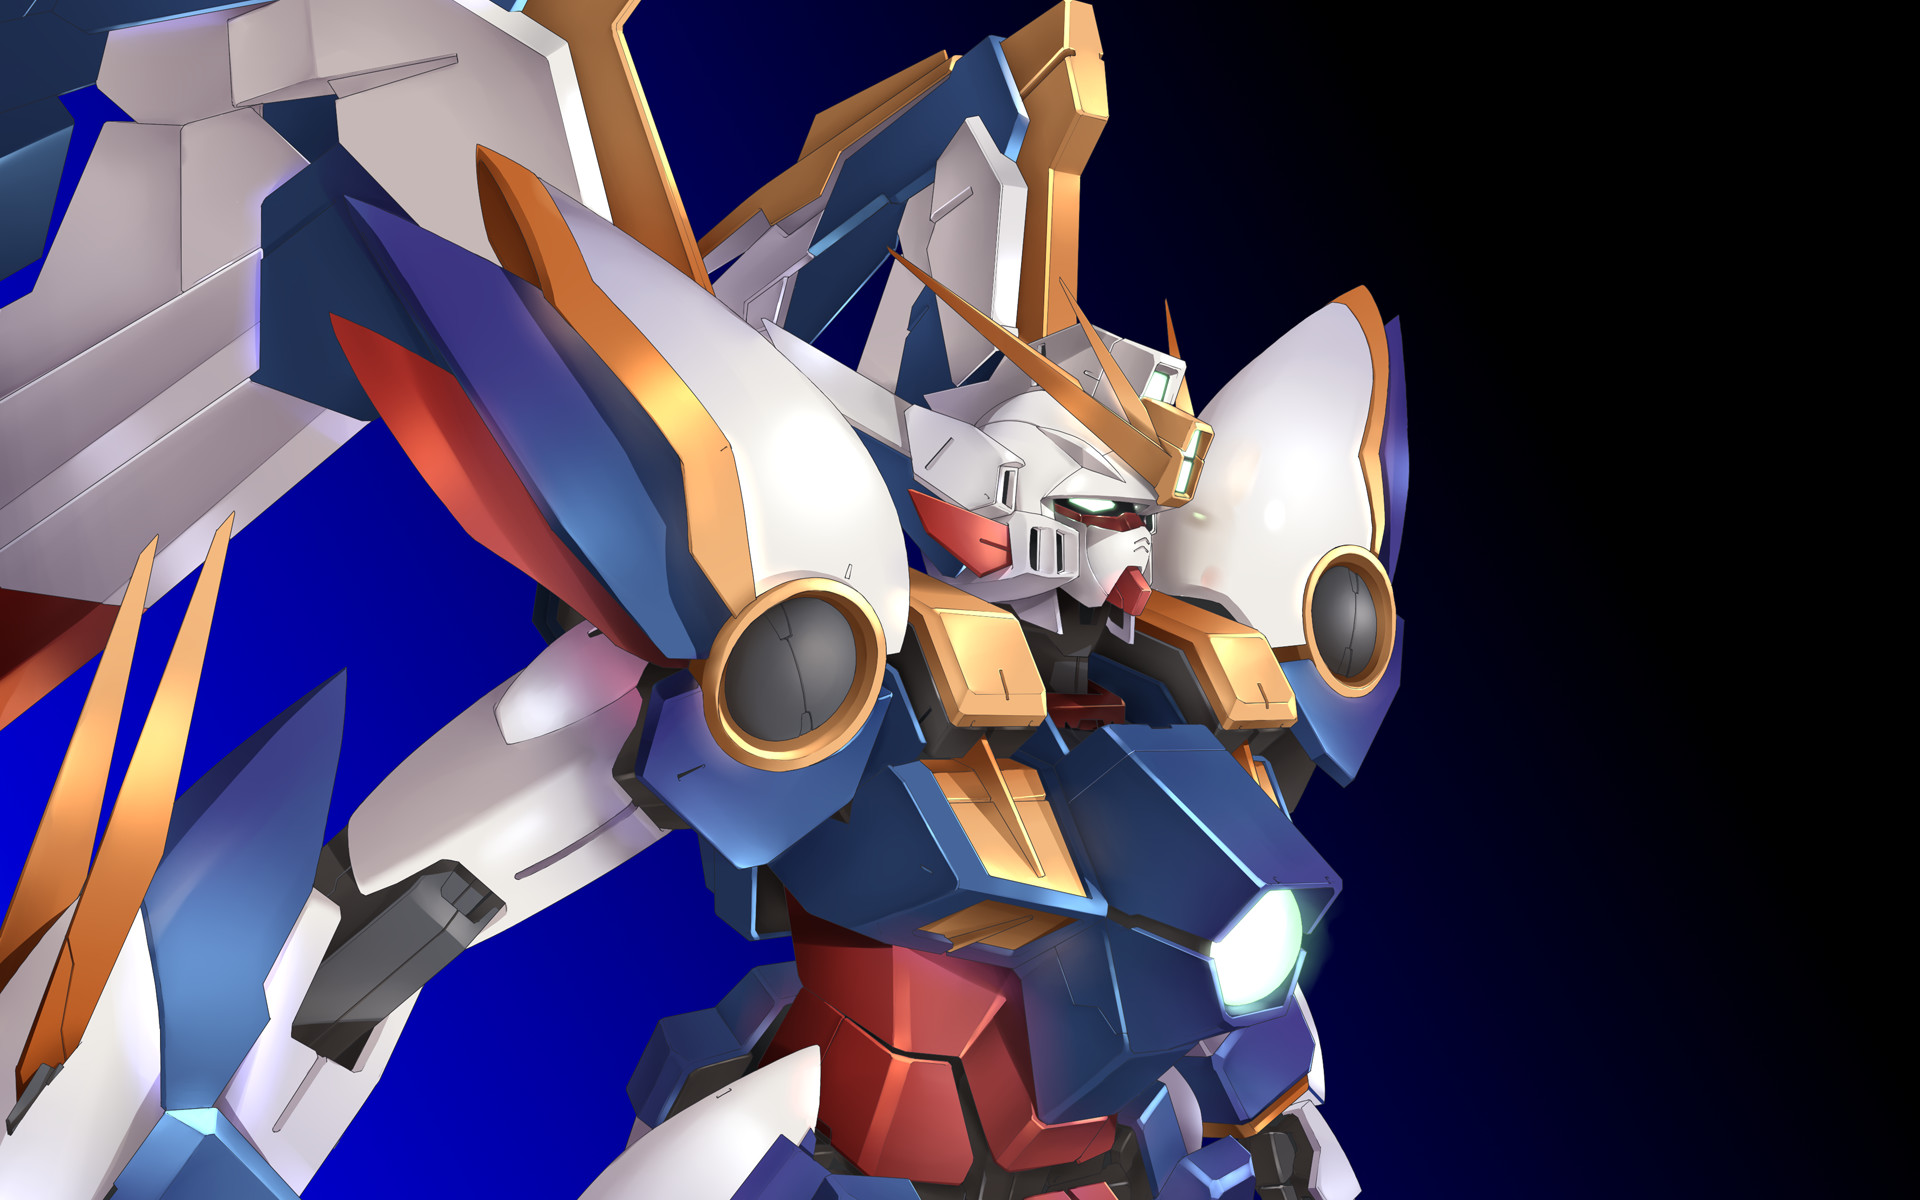 Mobile Suit Gundam Wing Wallpaper 19 | HD Desktop Wallpapers